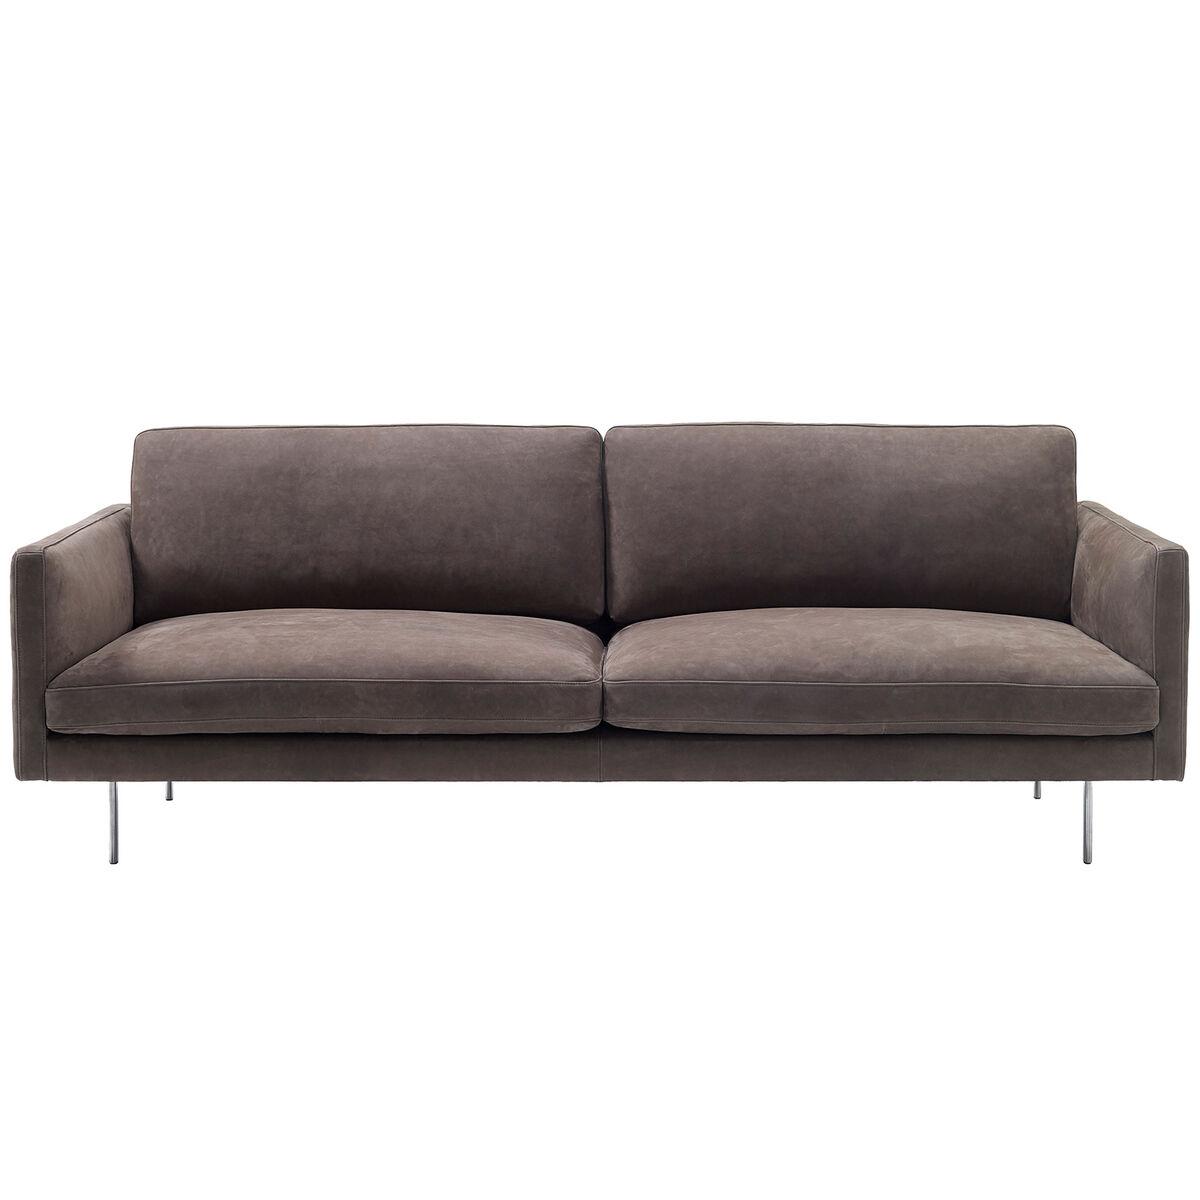 Adea Basel sohva, nupukkinahka